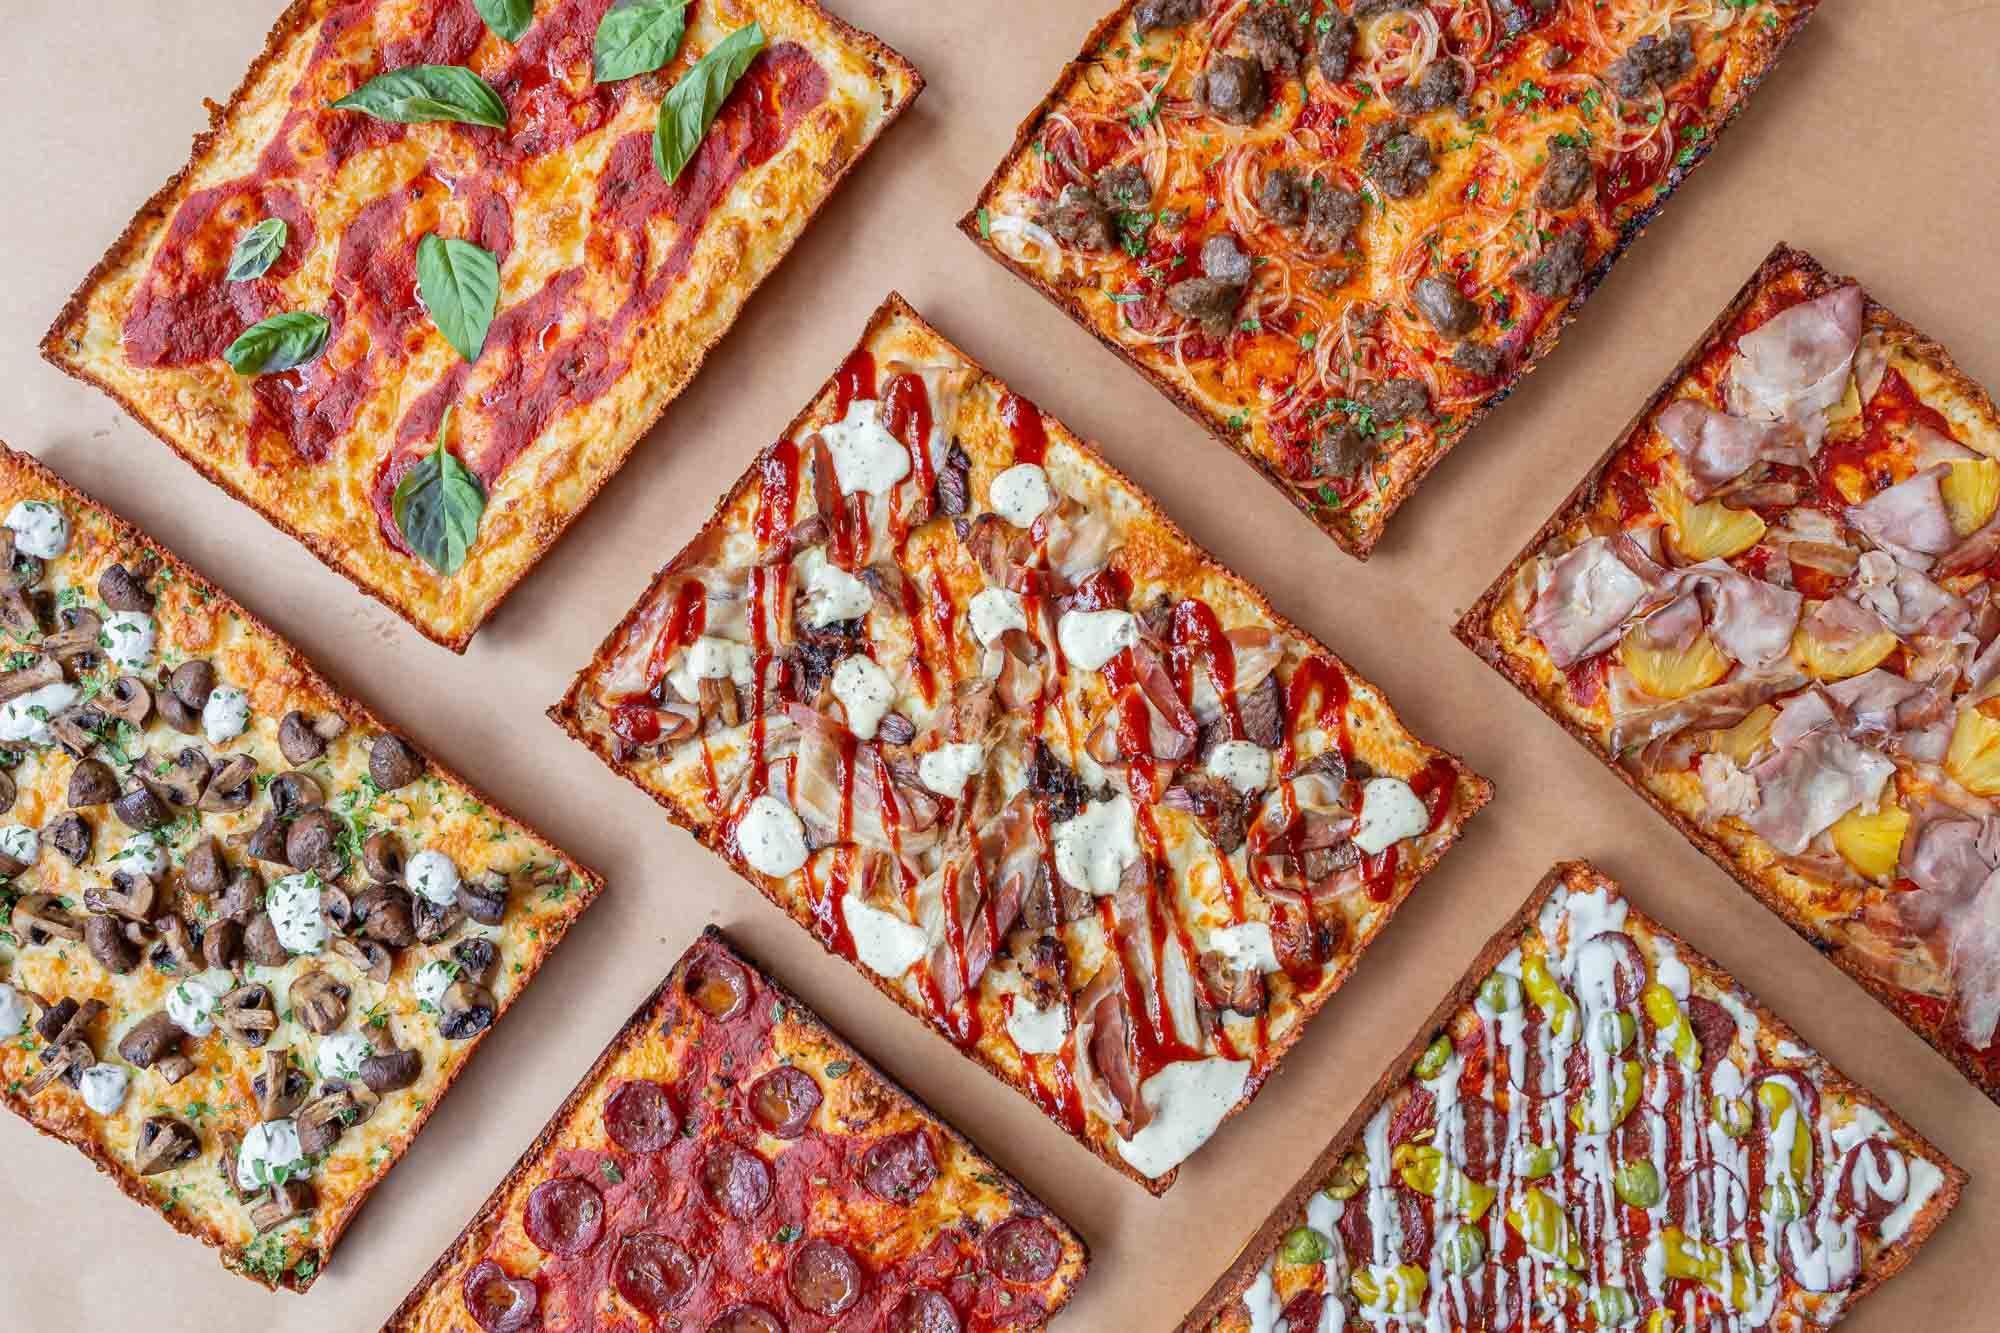 Flatlay of Detroit-style pizzas